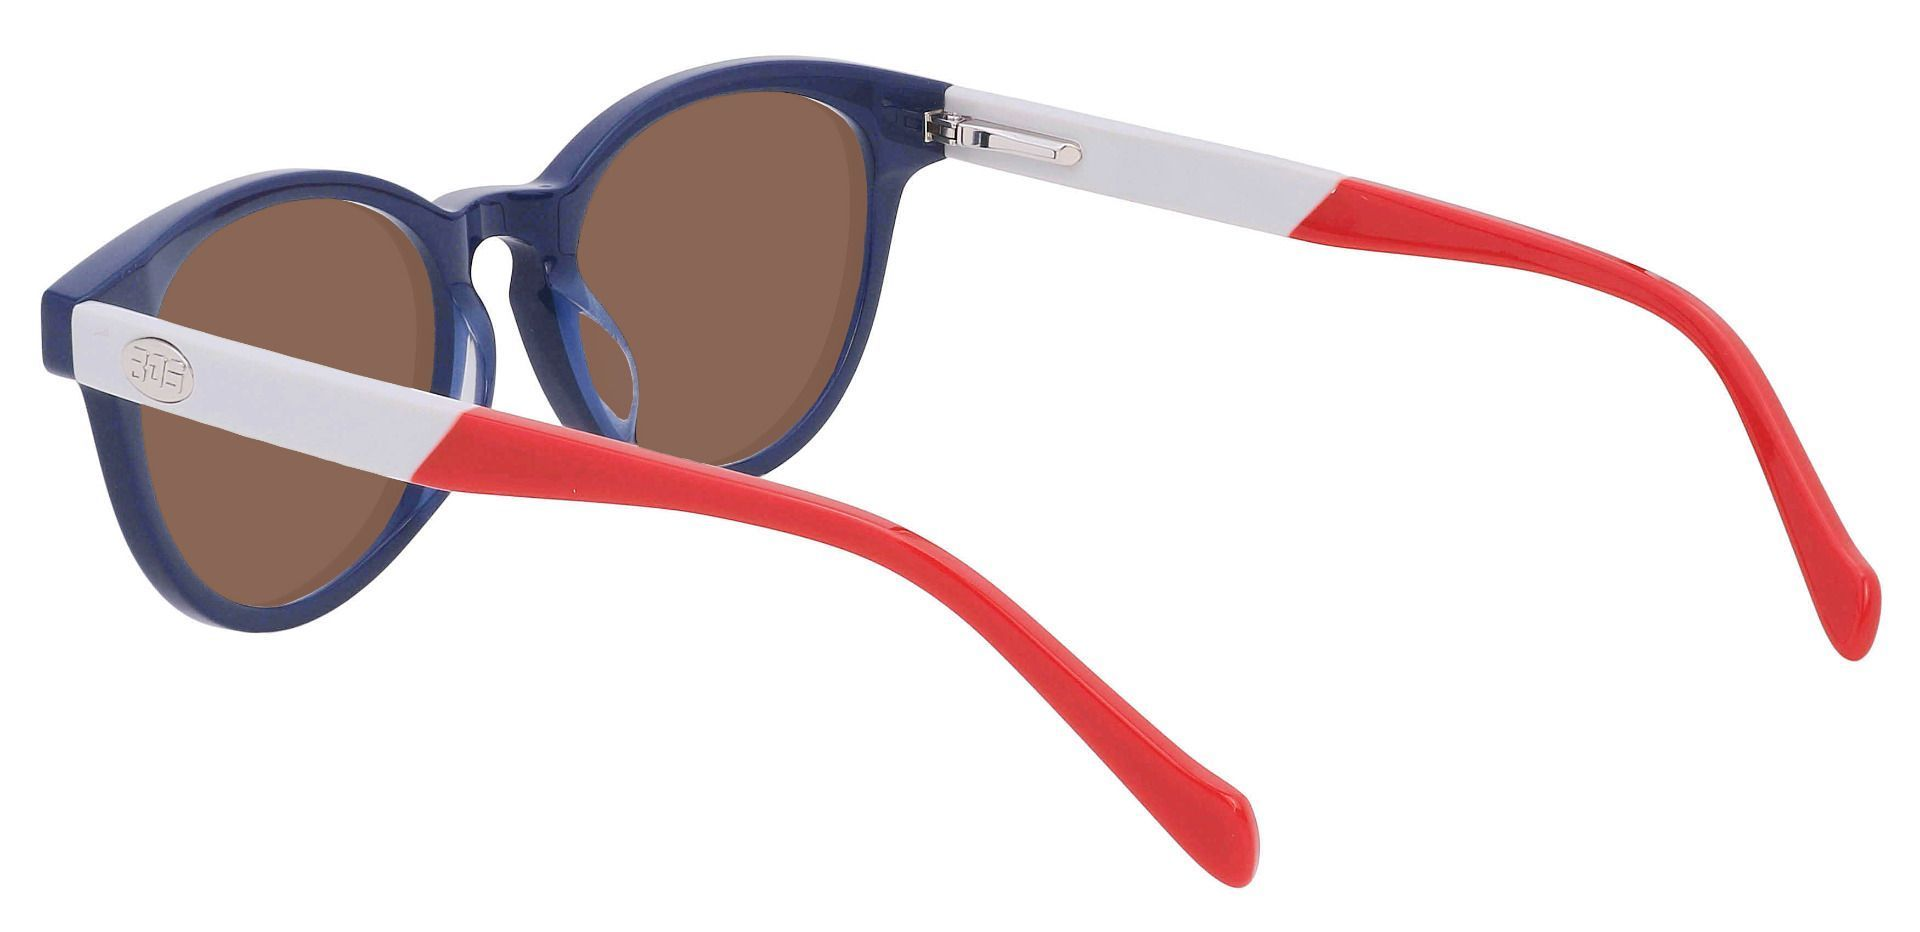 Revere Oval Prescription Sunglasses - Blue Frame With Brown Lenses